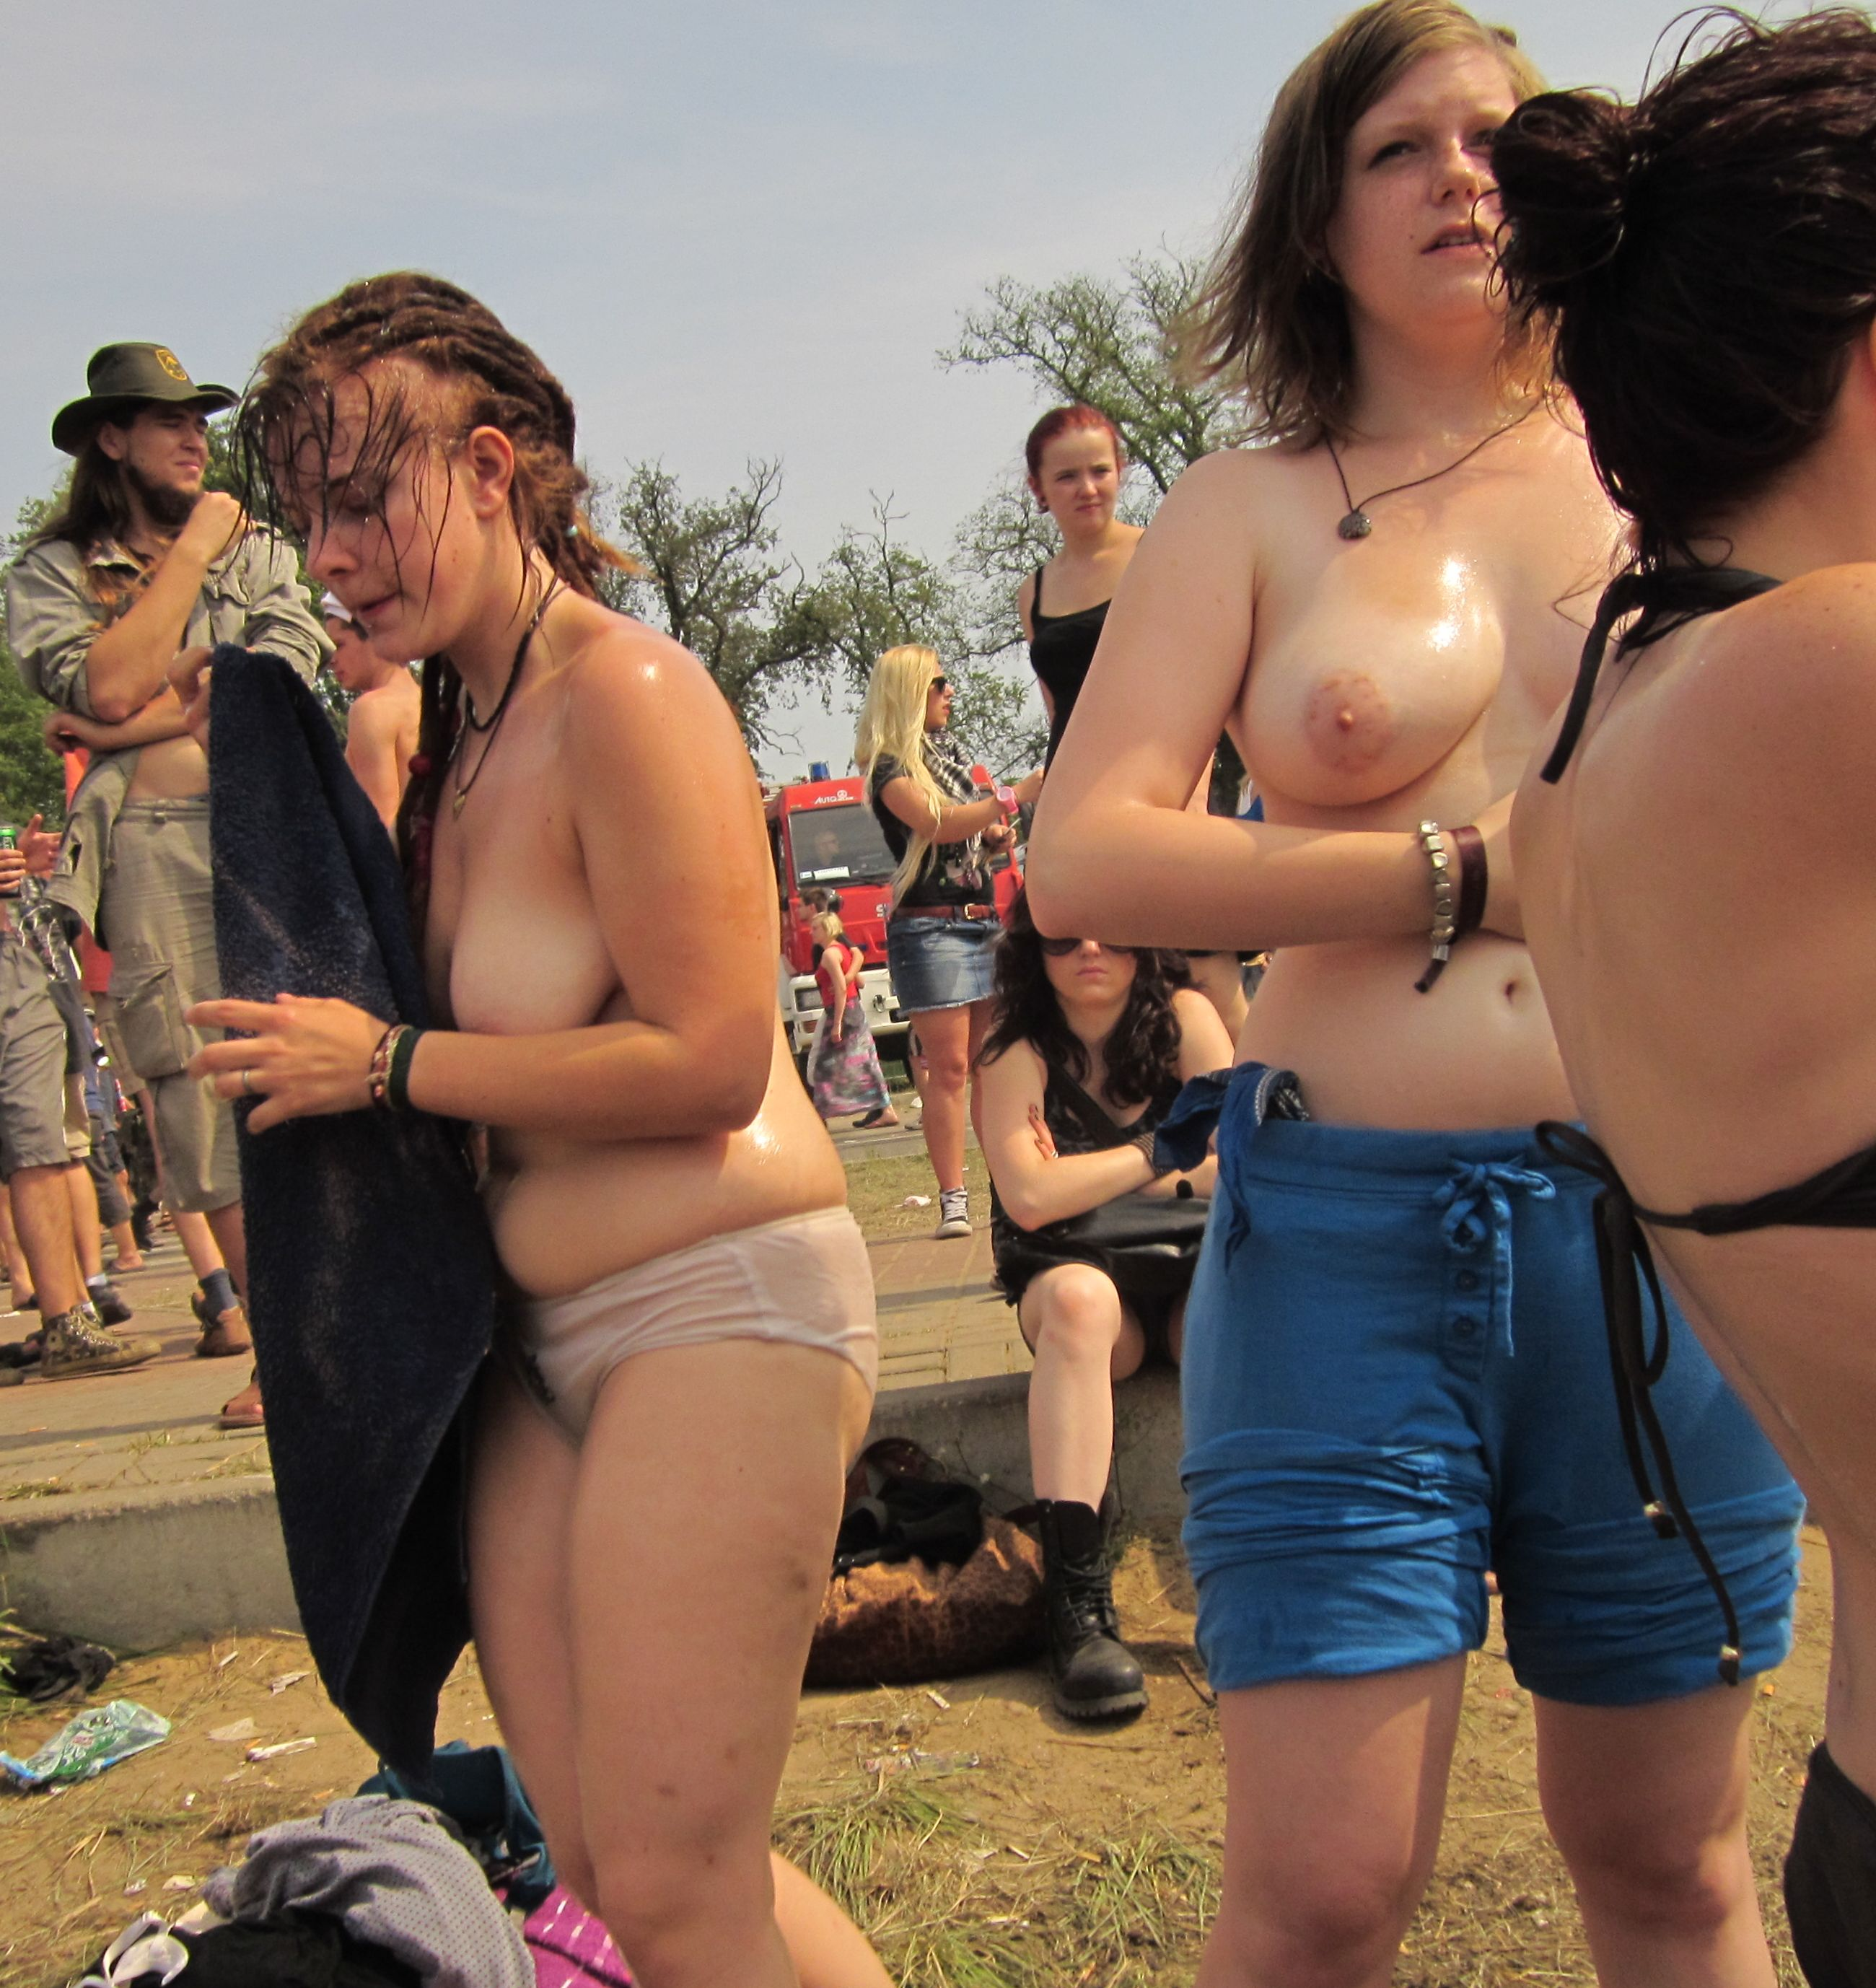 nudist trailer park sex gifs